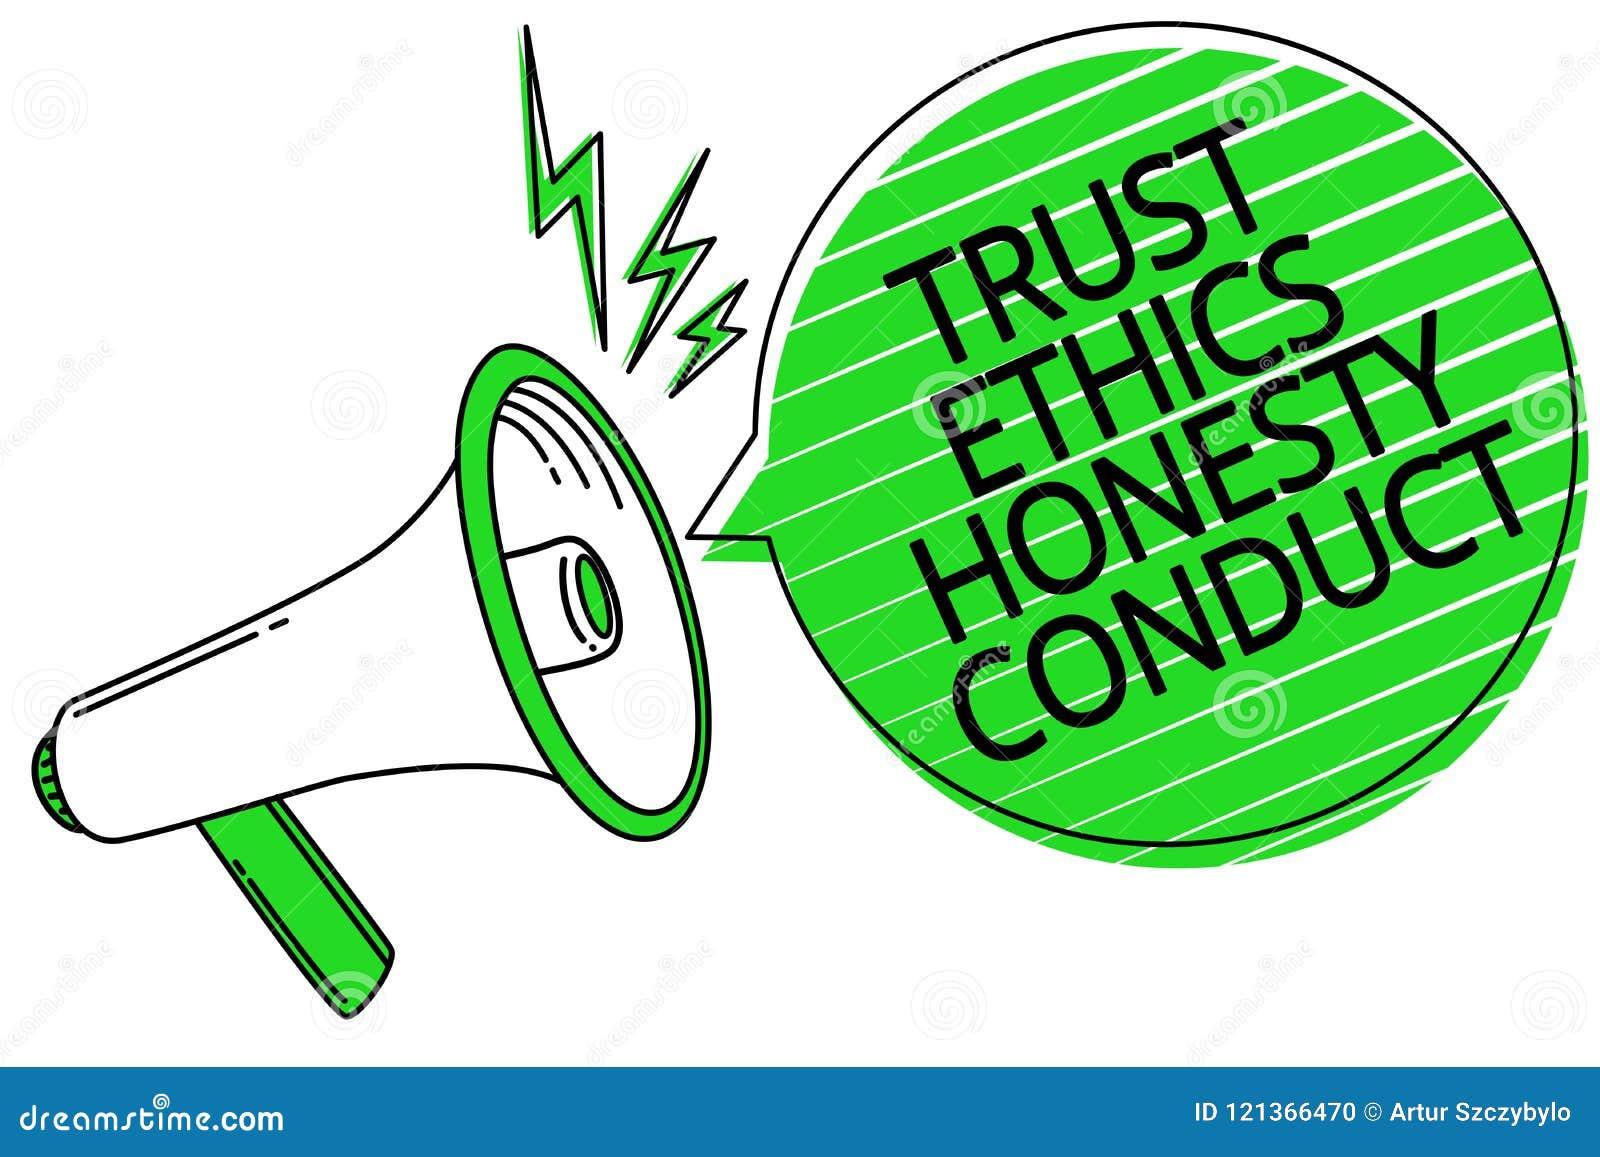 Muestra del texto que muestra conducta de la honradez de los éticas de la confianza La foto conceptual implica el altavoz positiv